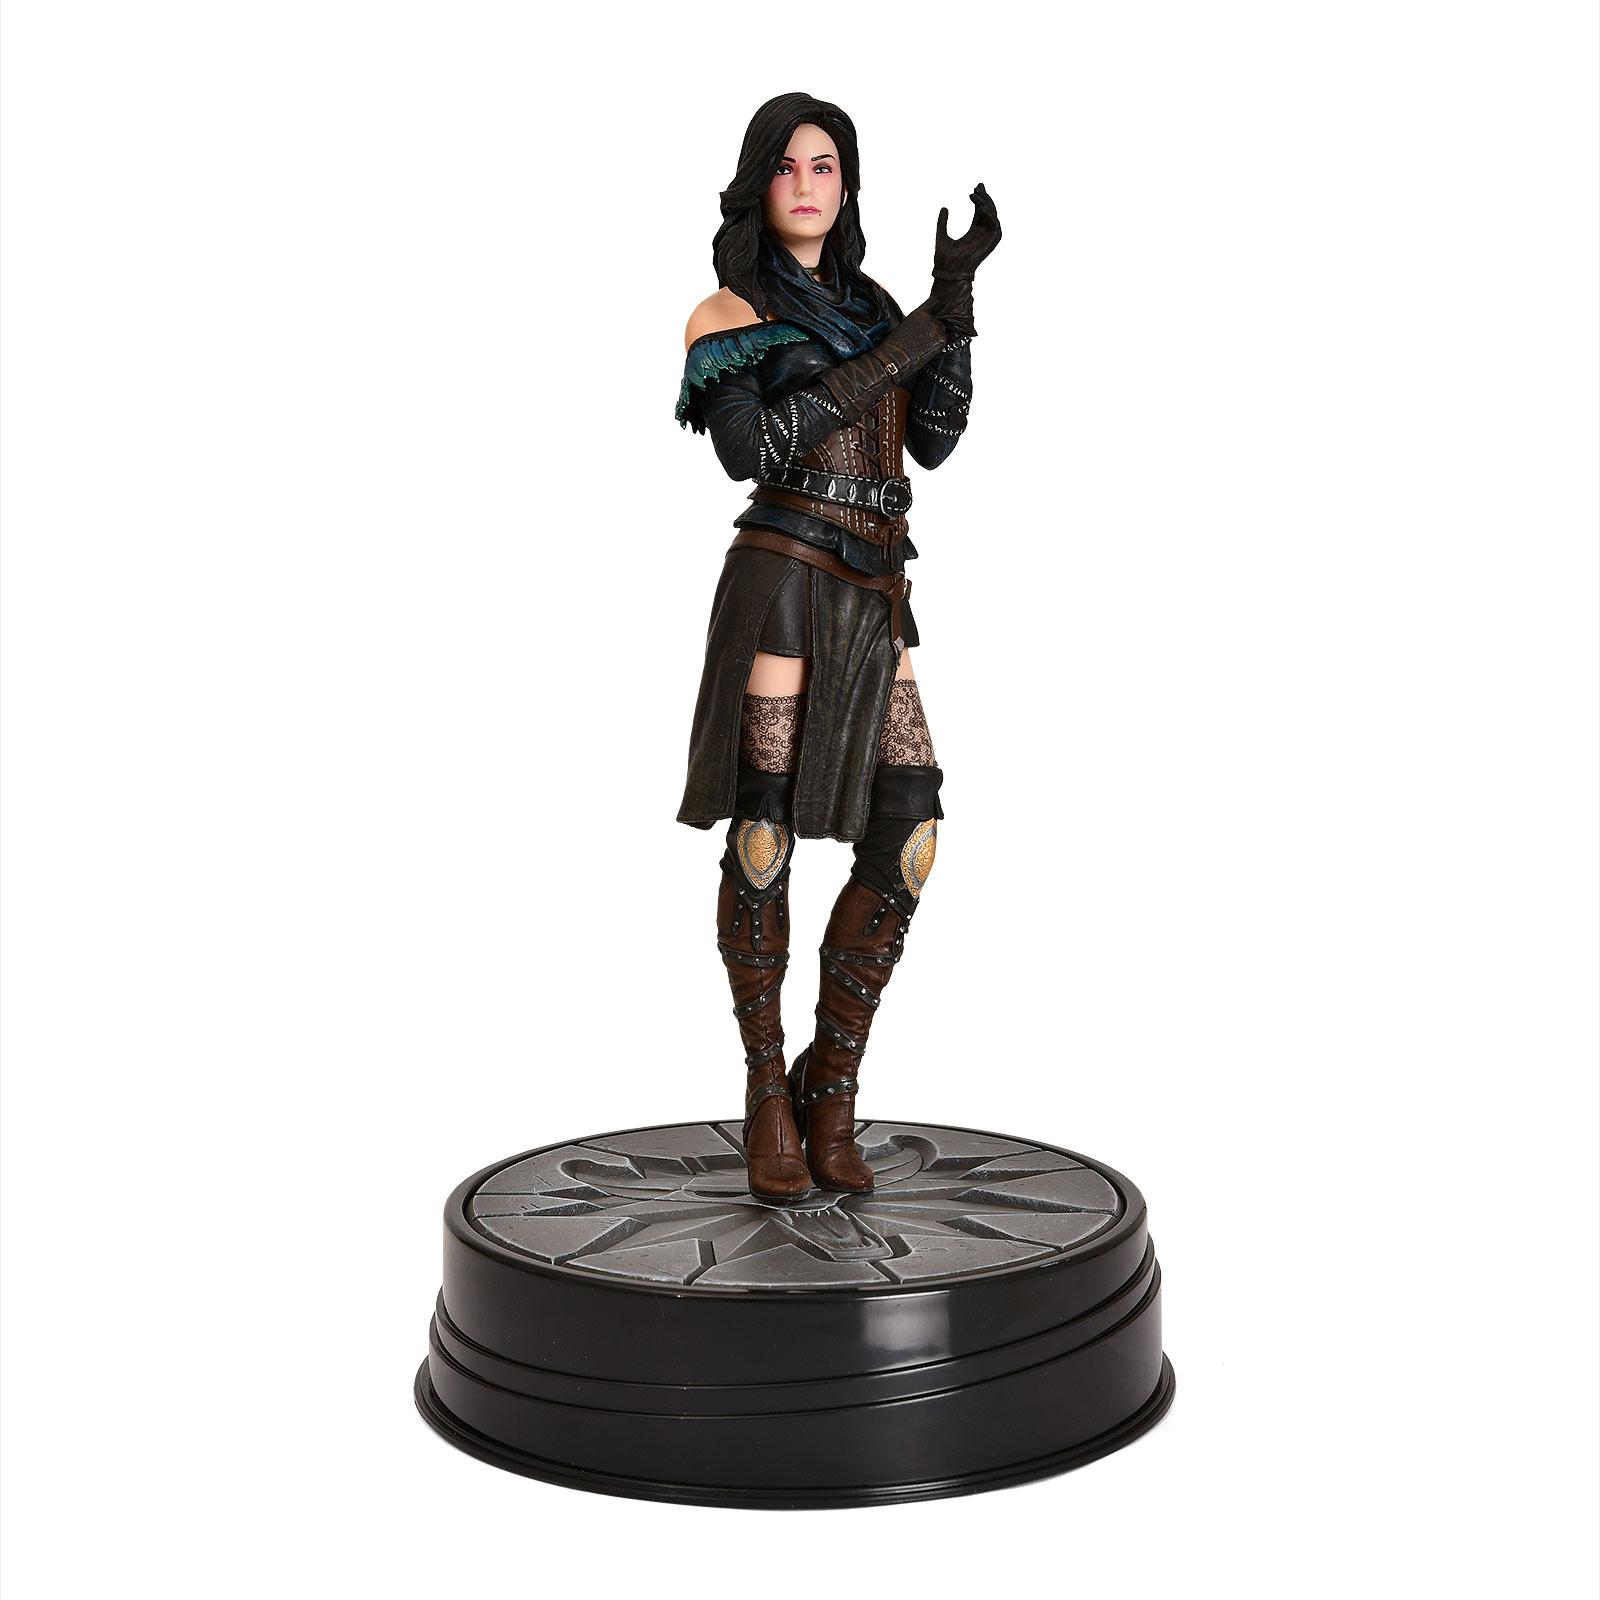 Witcher - Yennefer Series 2 Statue 25 cm